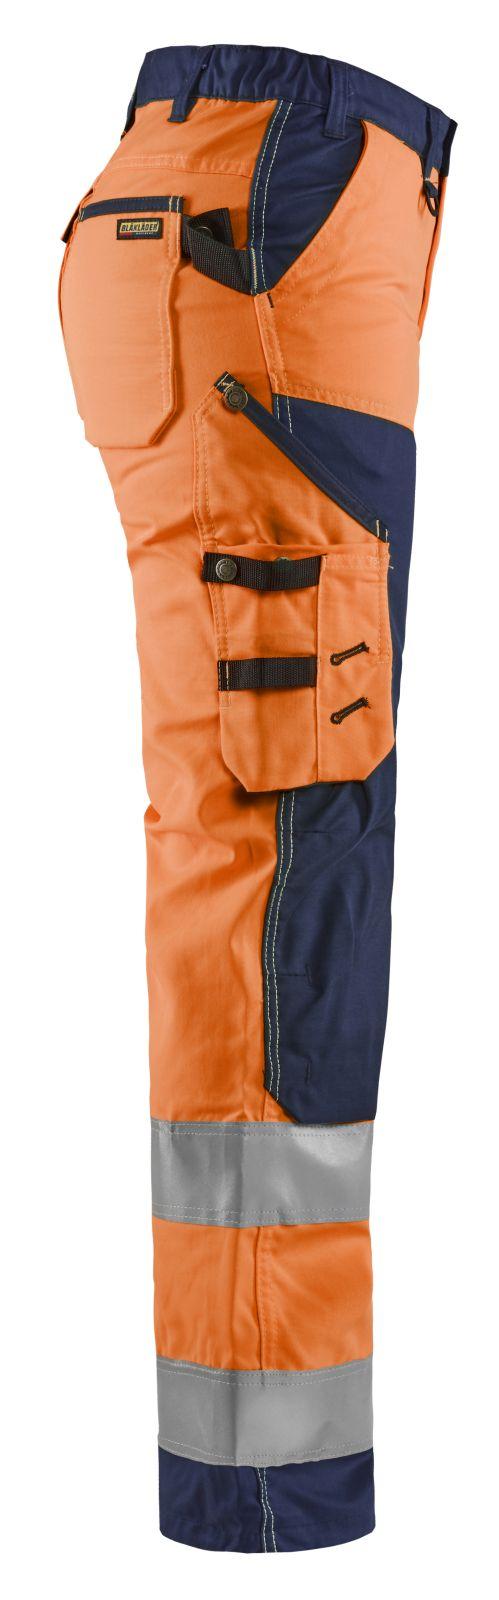 Blaklader Dames werkbroeken 71551811 High Vis oranje-marineblauw(5389)